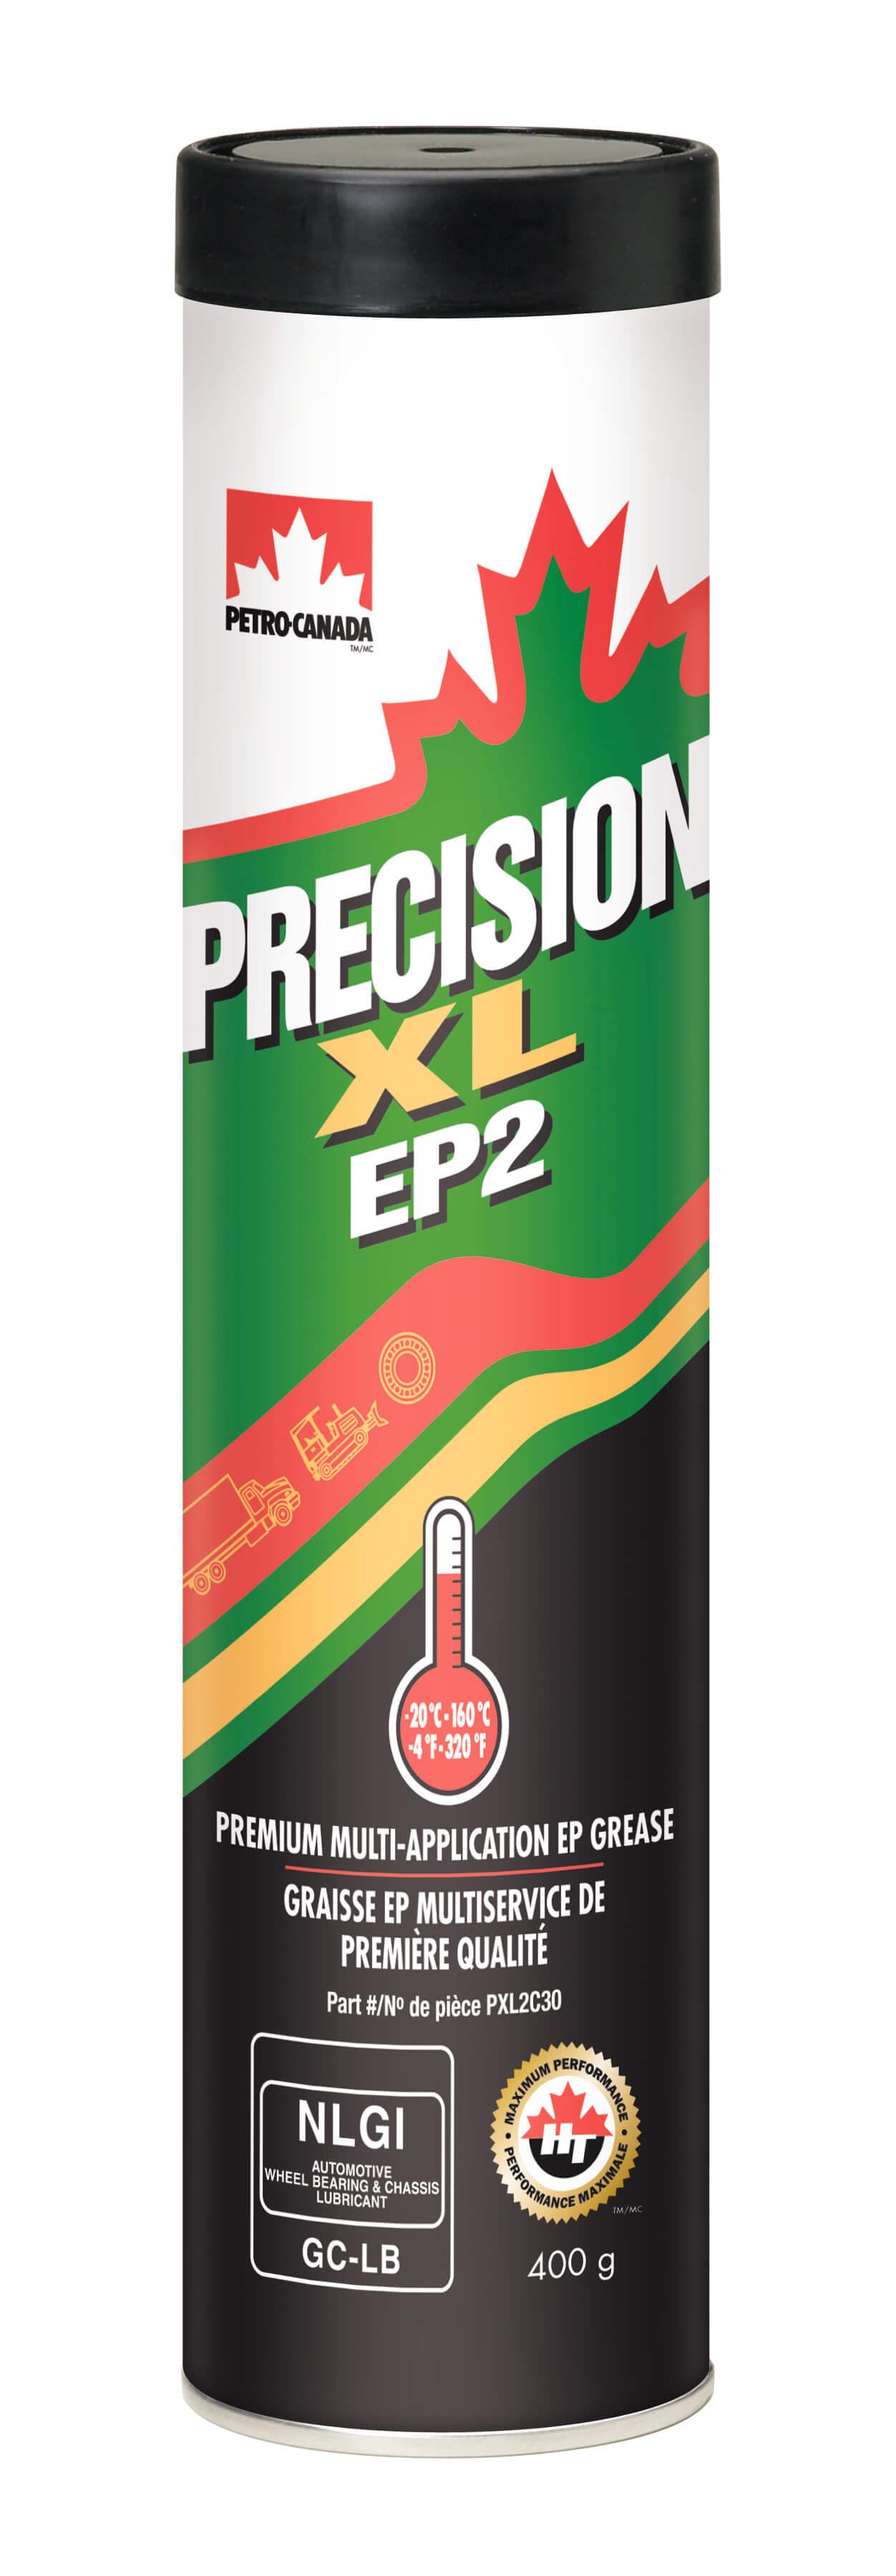 Petro-Canada   Precision XL EP2